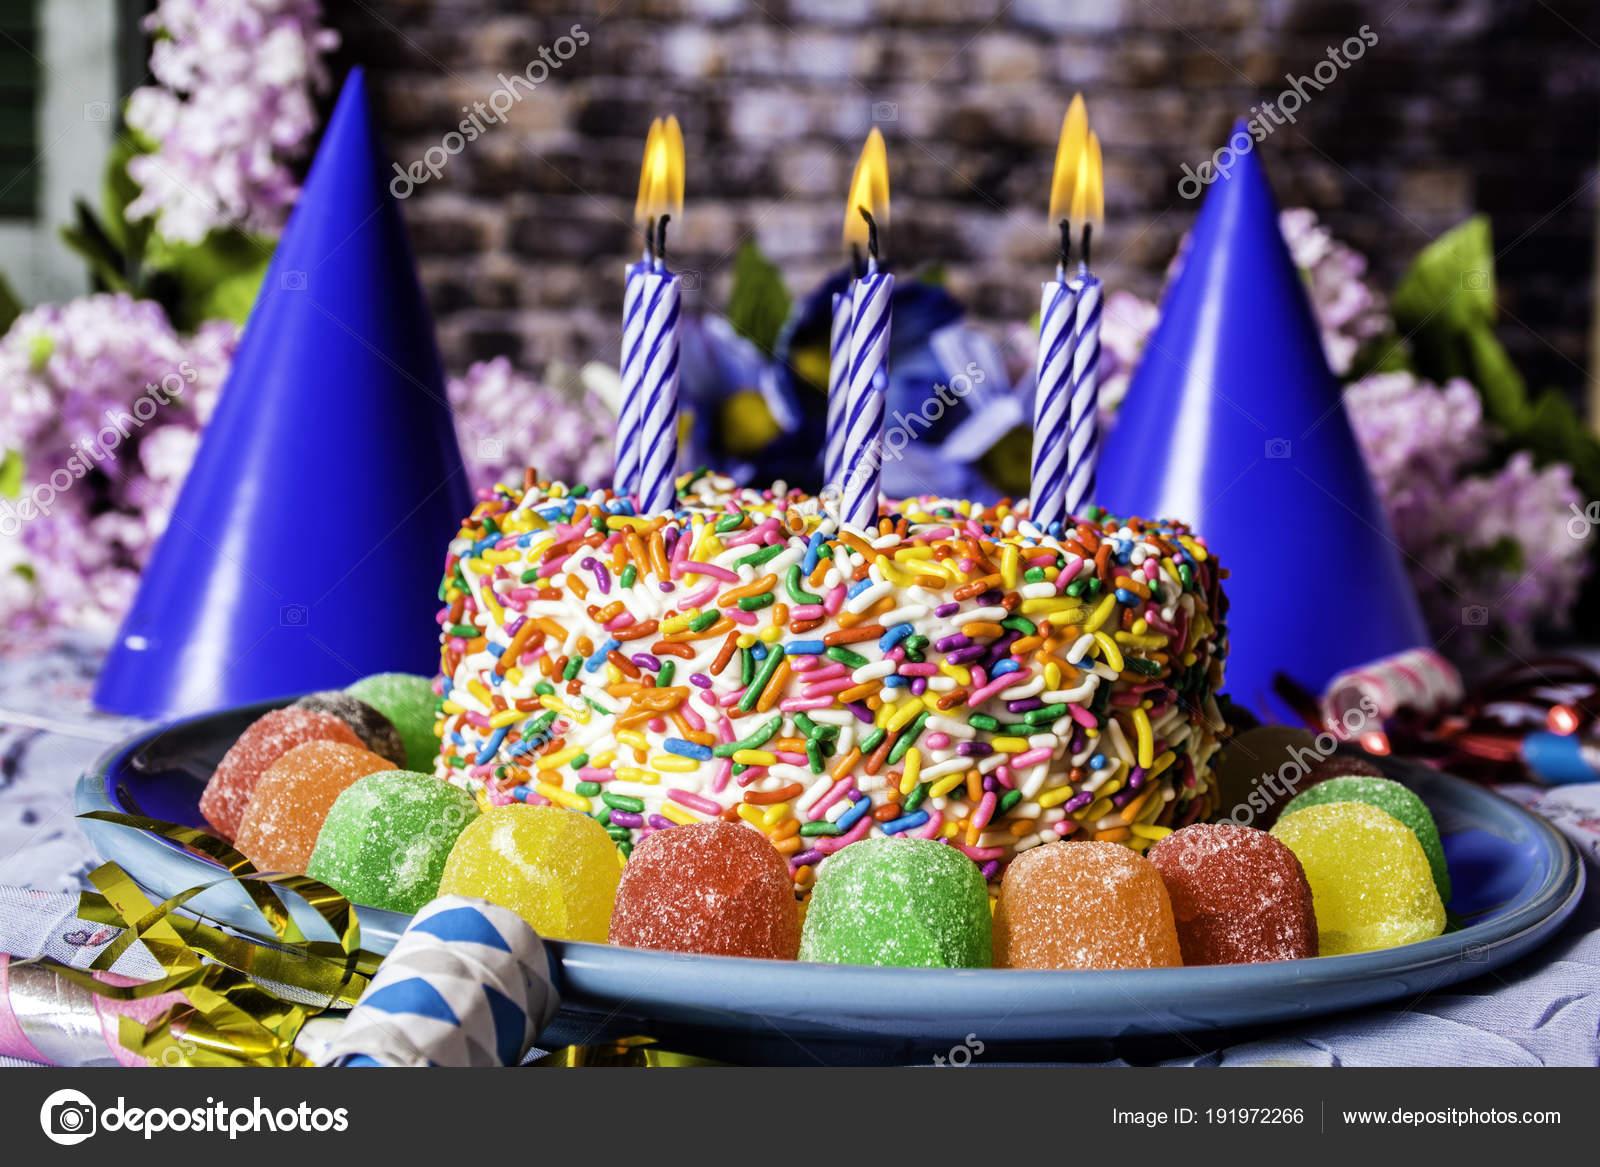 Birthday Cake Rainbow Sprinkles Blue Plate Surrounded